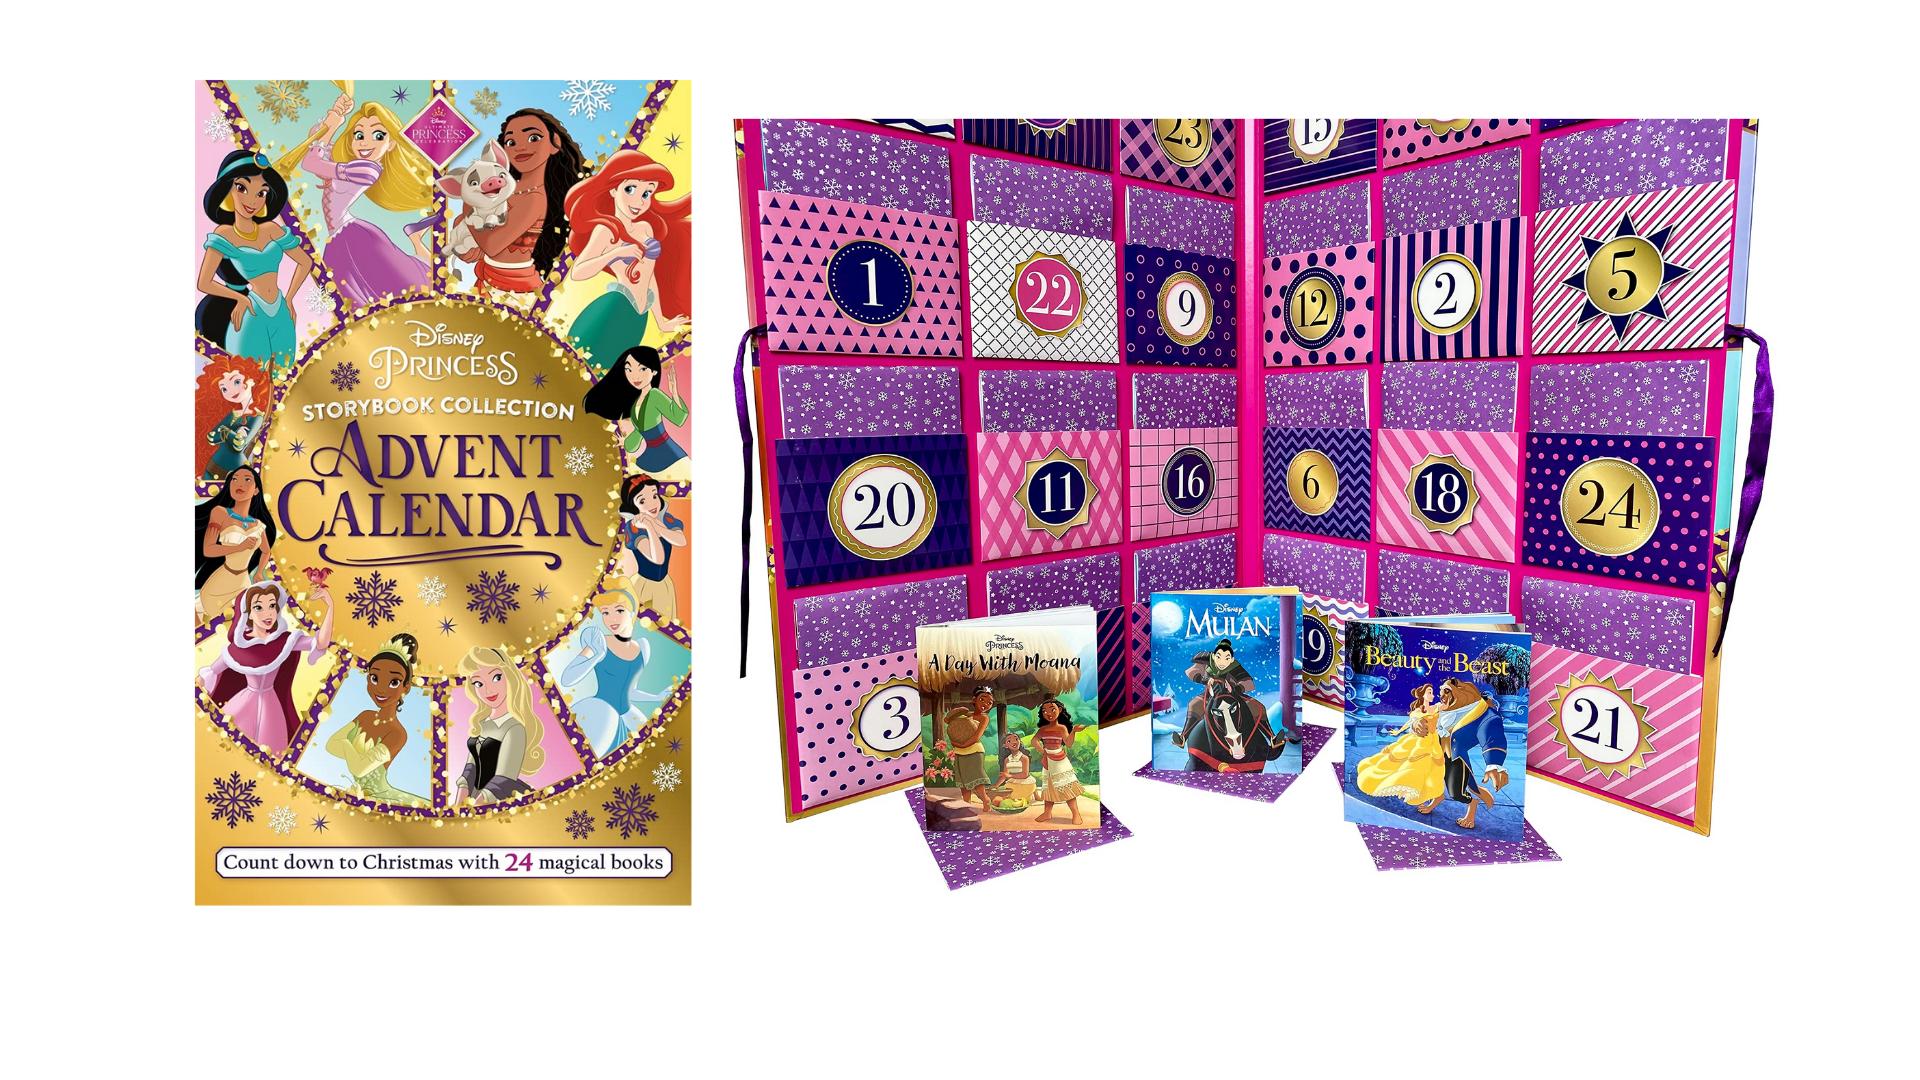 Calendrier de l'avent Disney Princesse Livre 2021